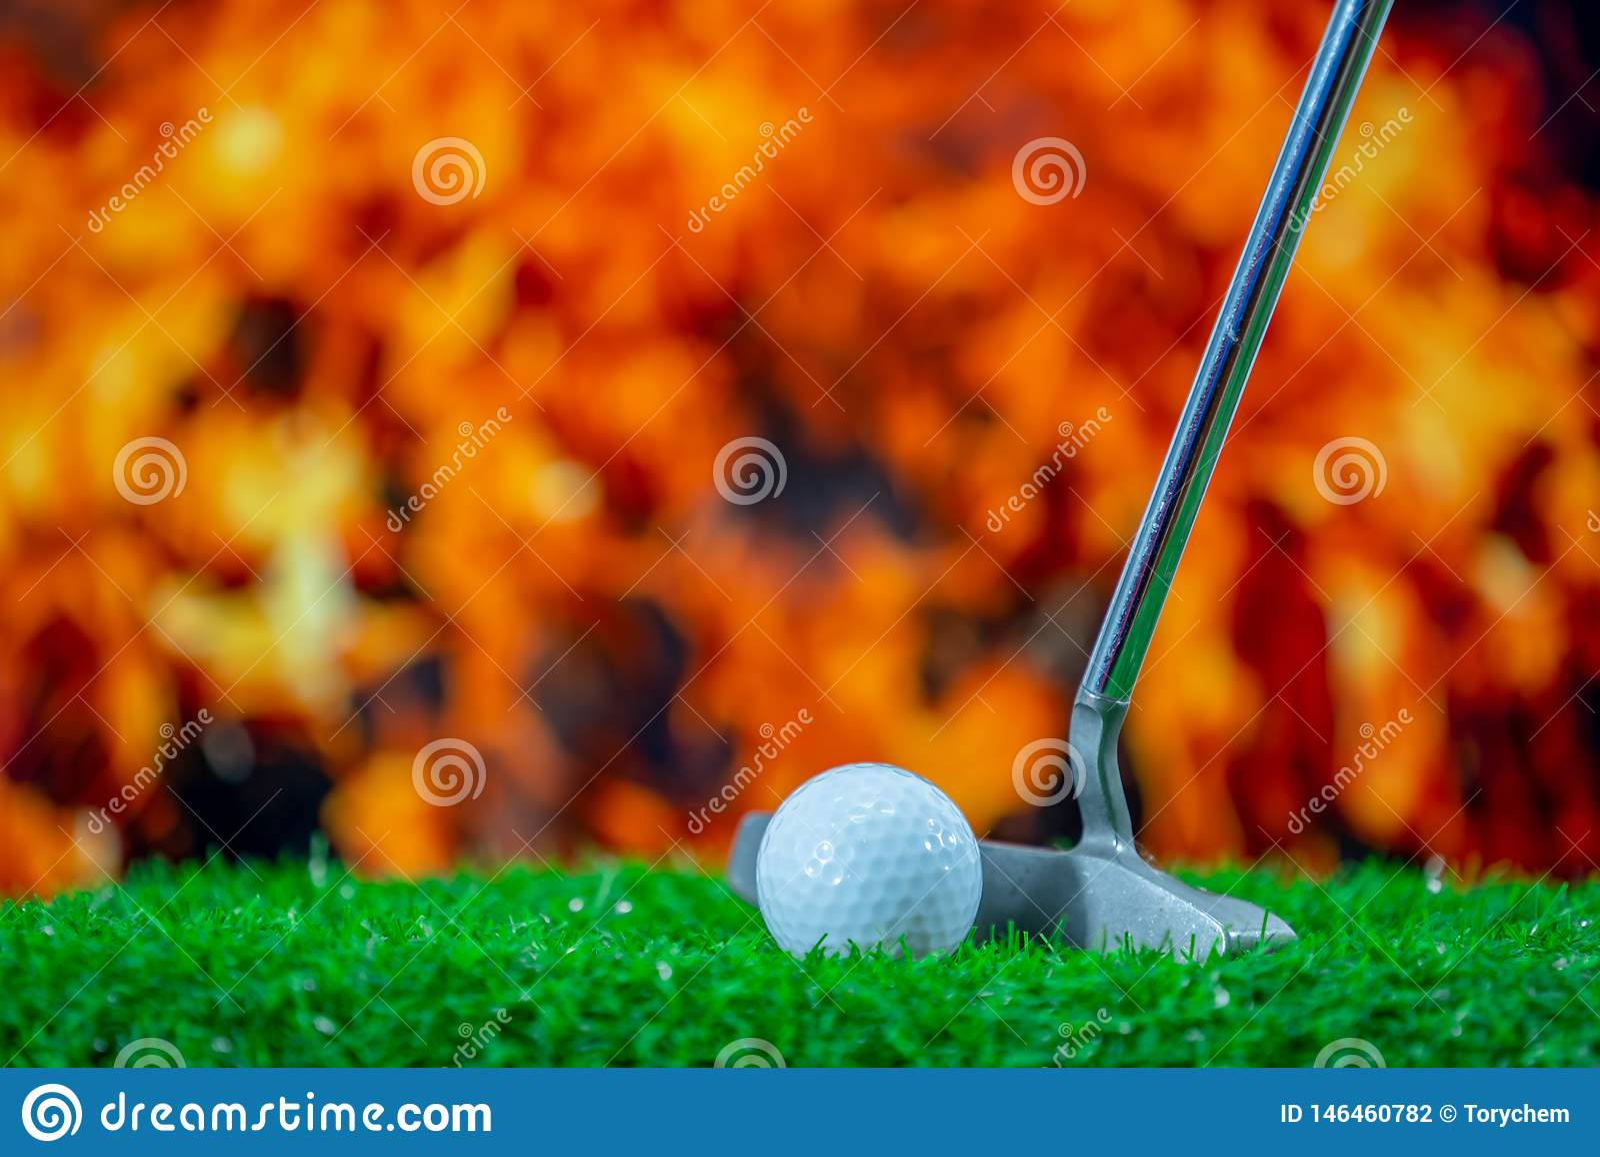 Golf club and golf ball on grass